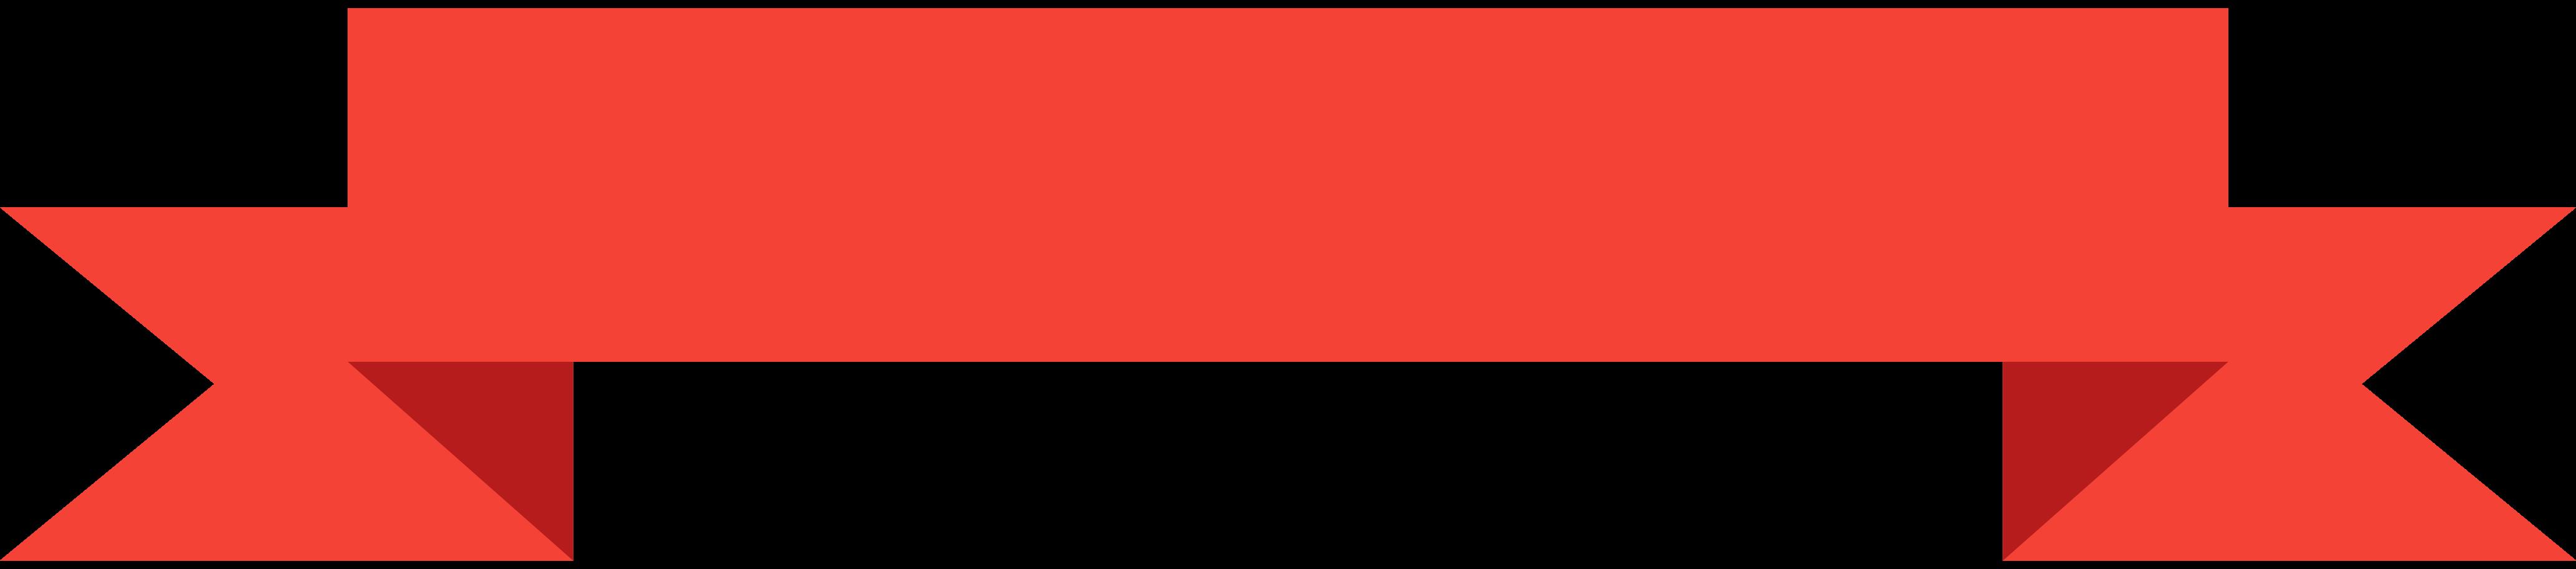 ribbon Clipart illustration in PNG, SVG